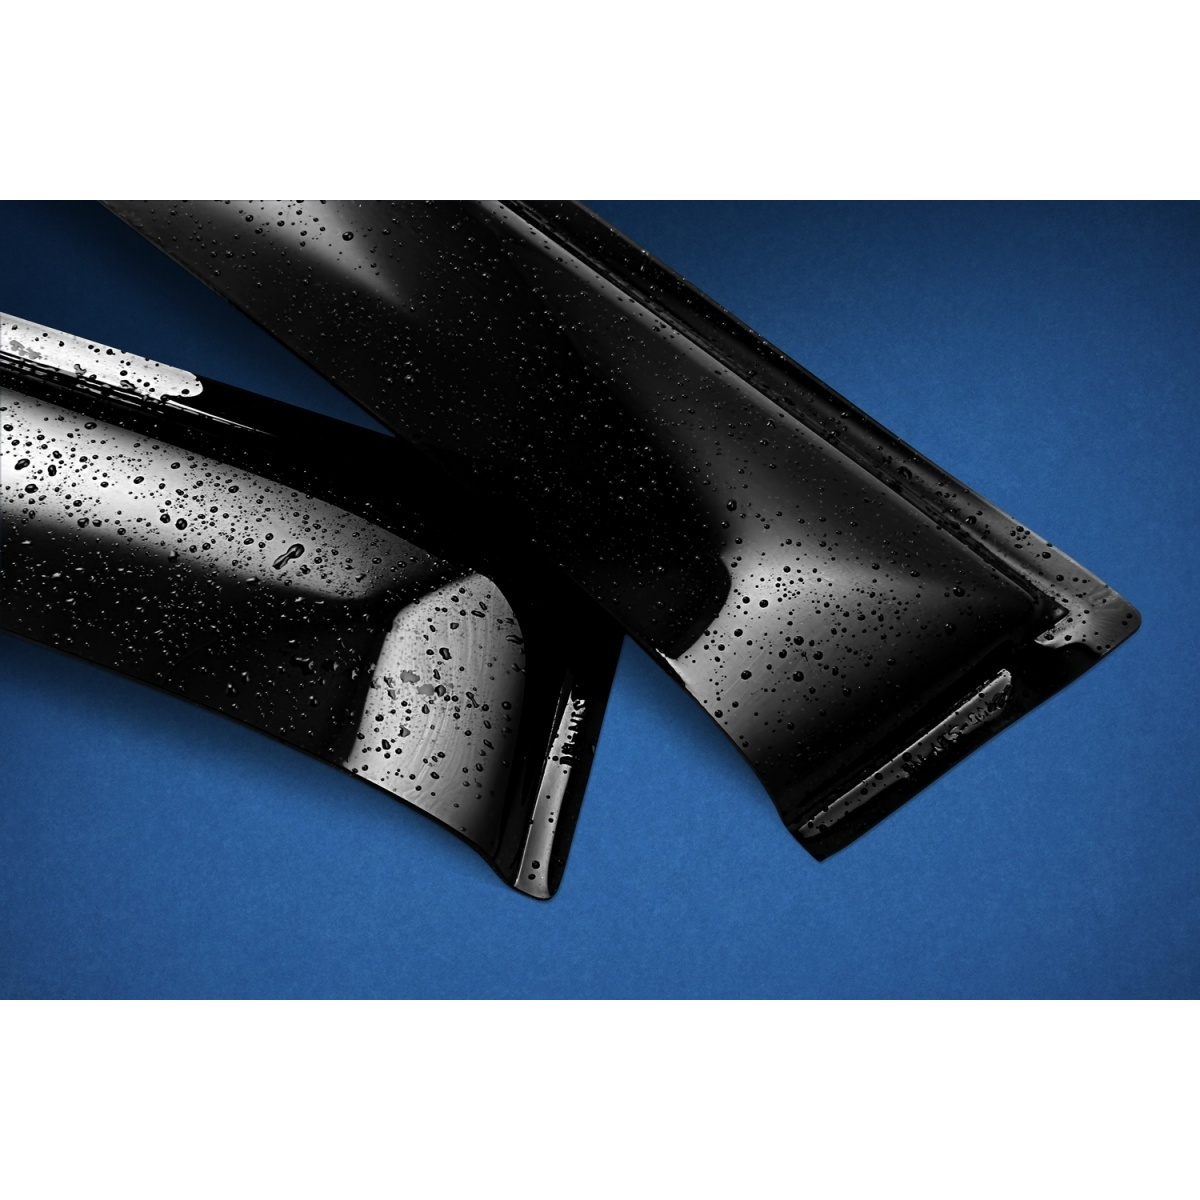 Okno deflektor (2 szt.) Citroen C4 3D 2004-2014 I hatchback (Citroen C 4)